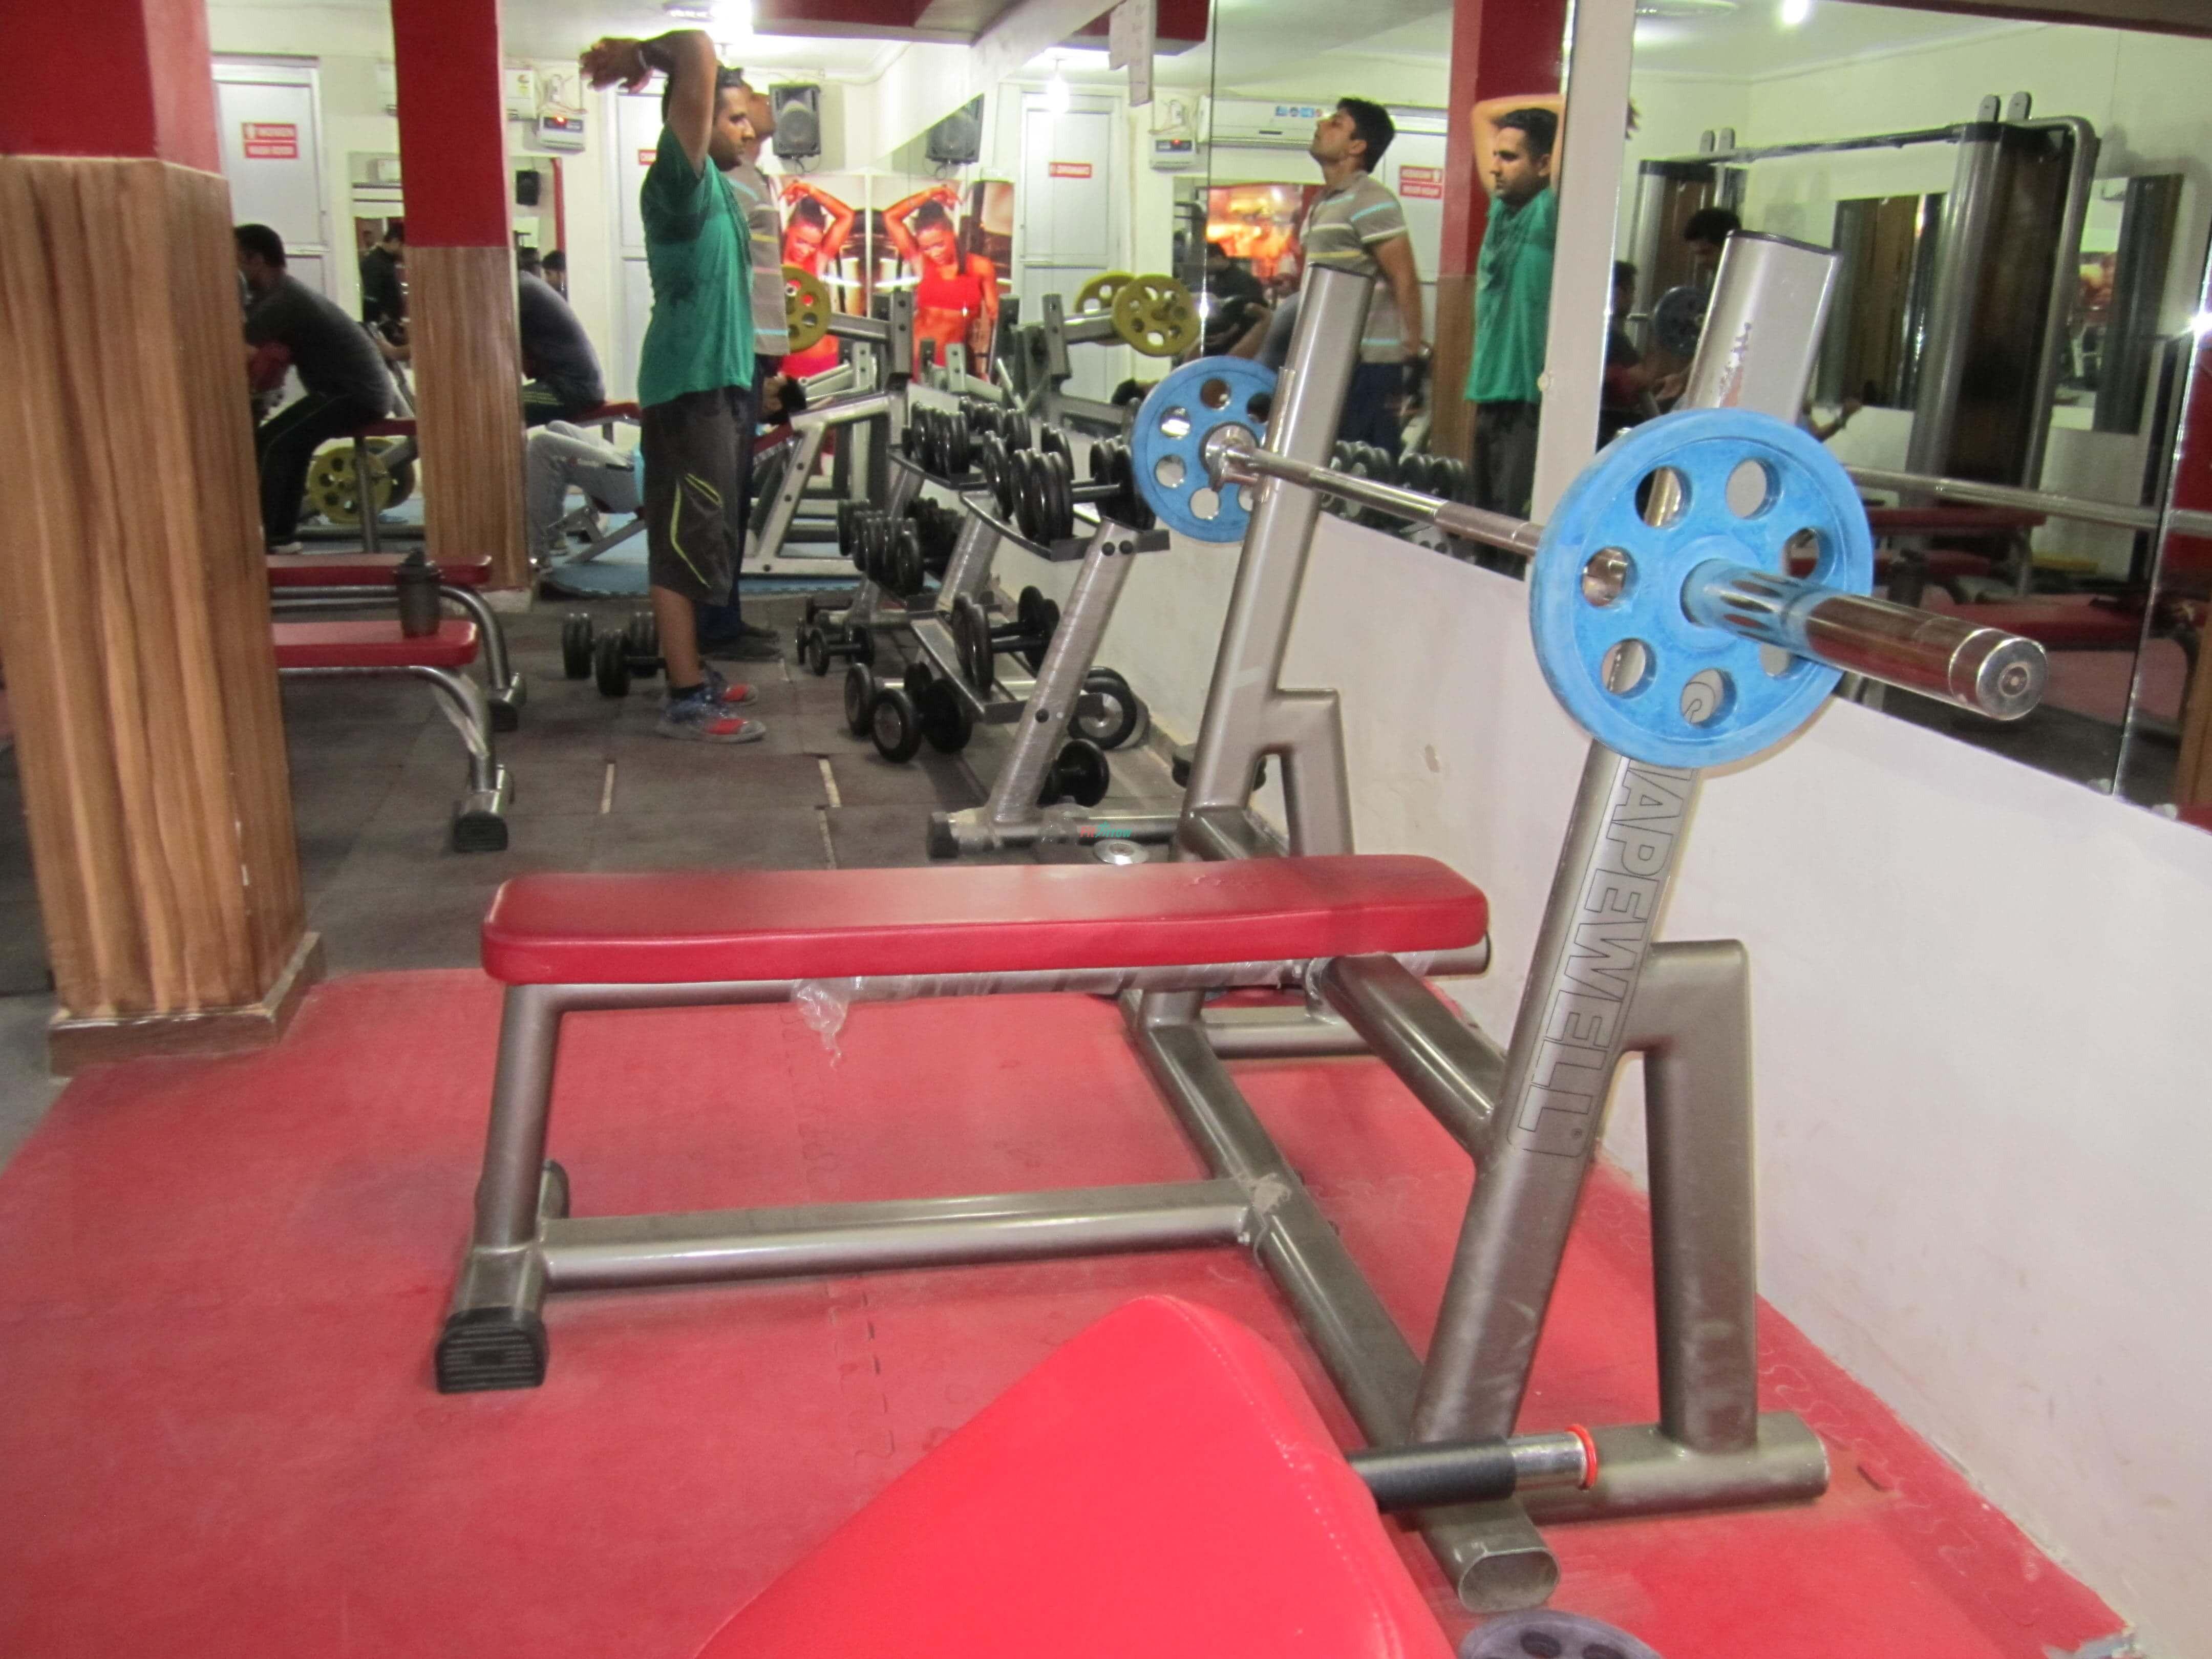 Body Cafe Gym South City 1